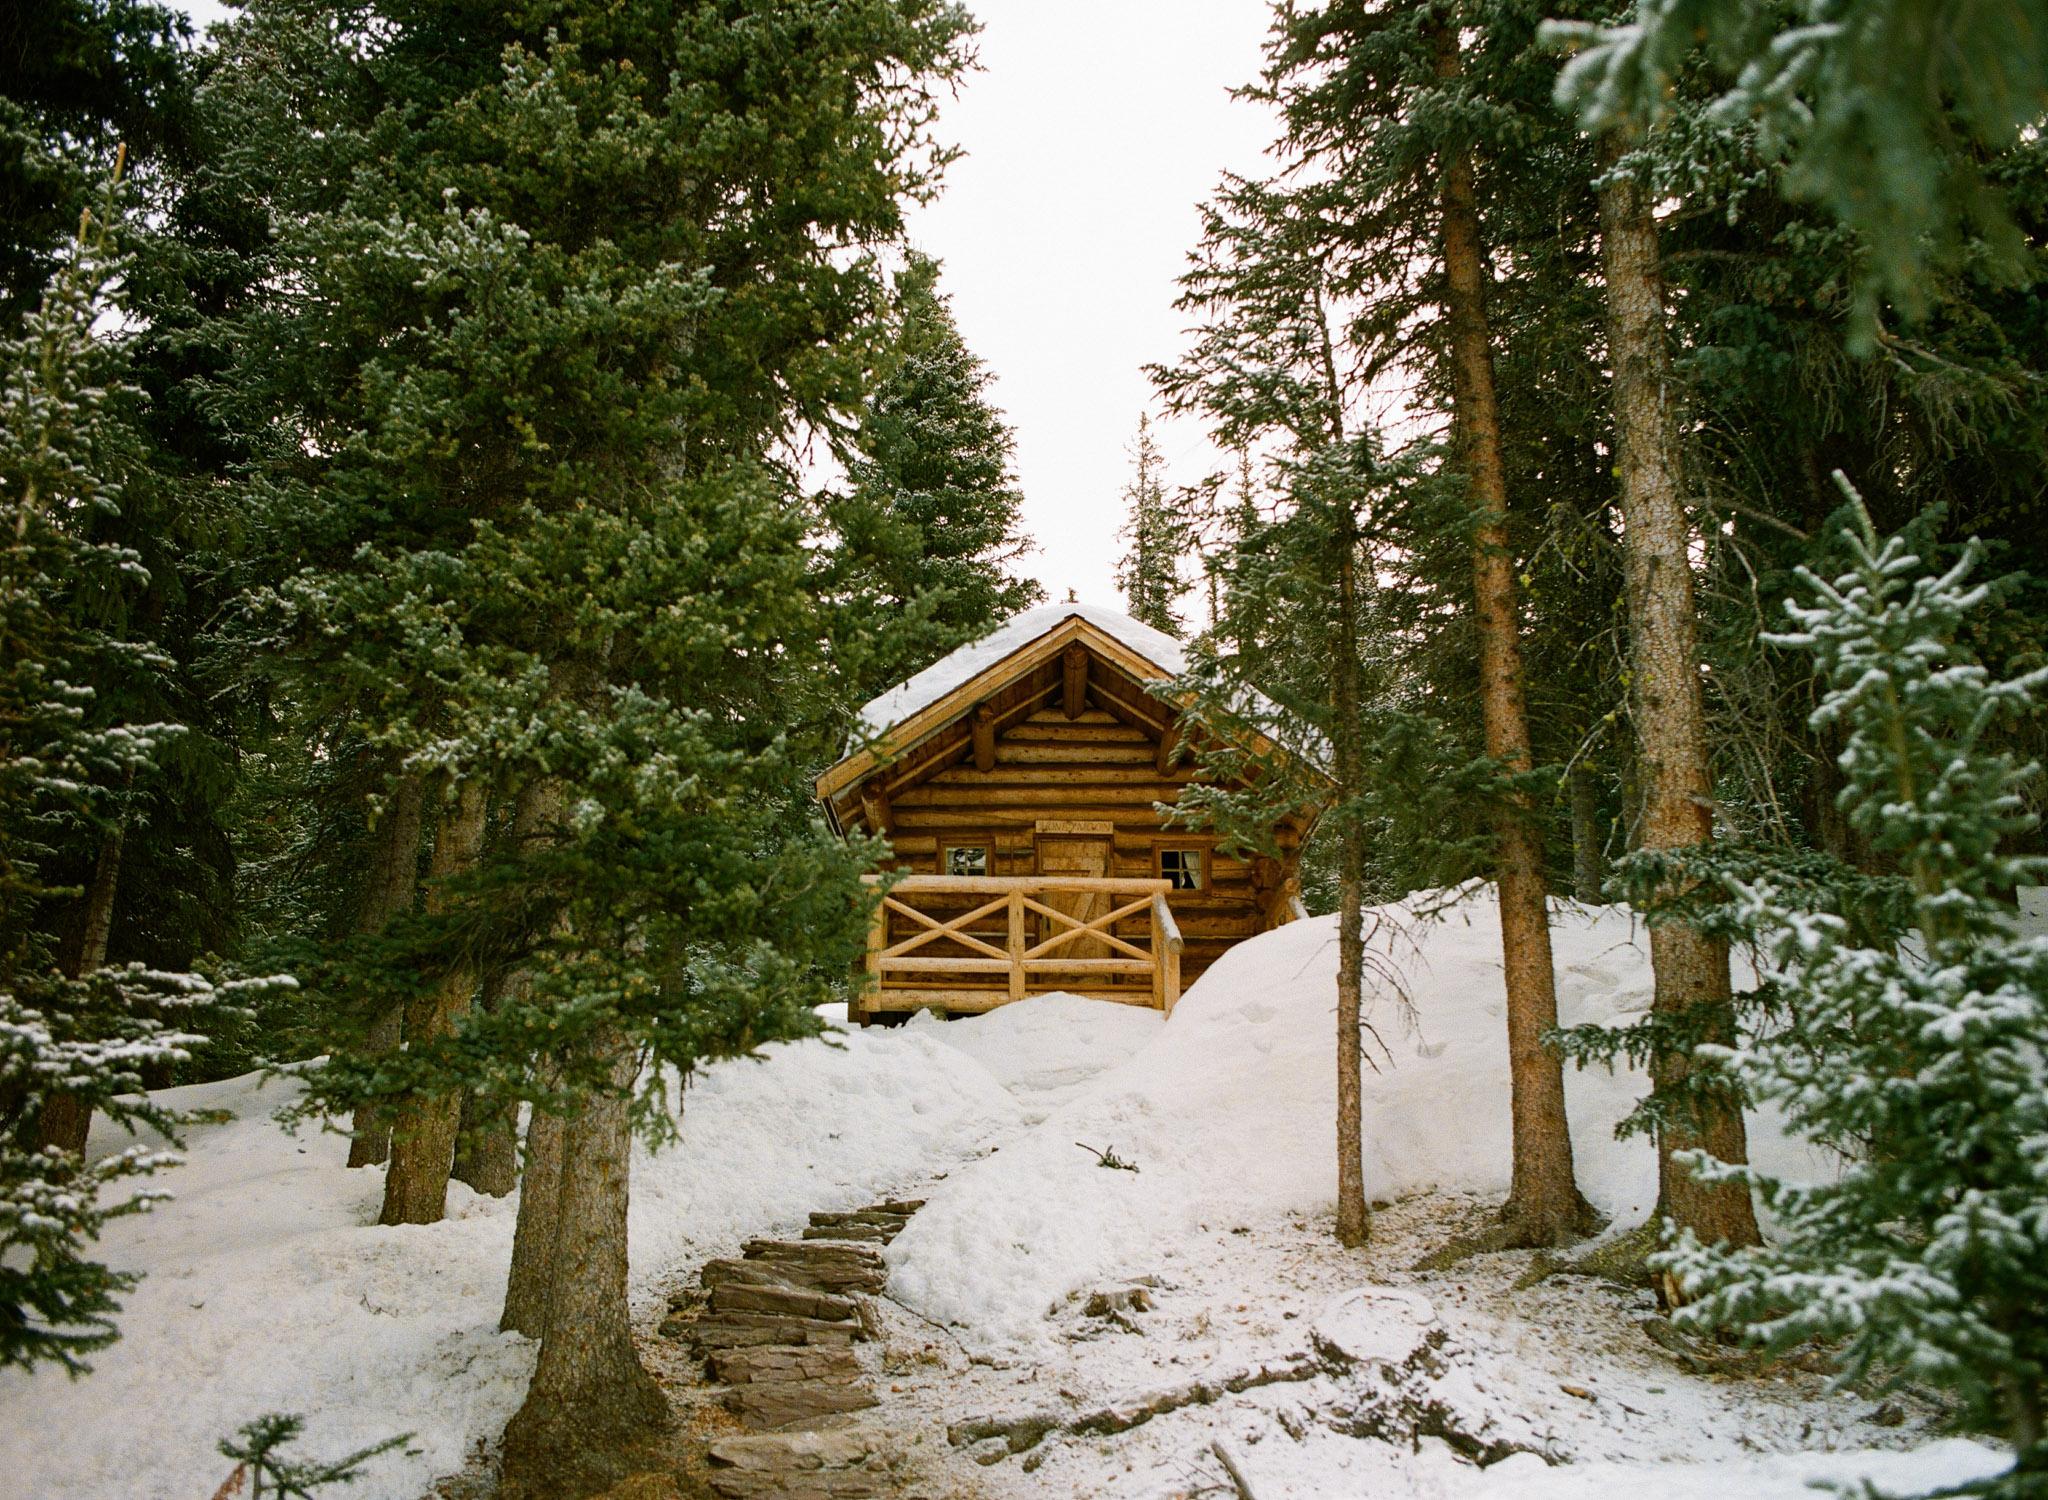 The Honeymoon Cabin at Skoki Lodge. // Portra 800